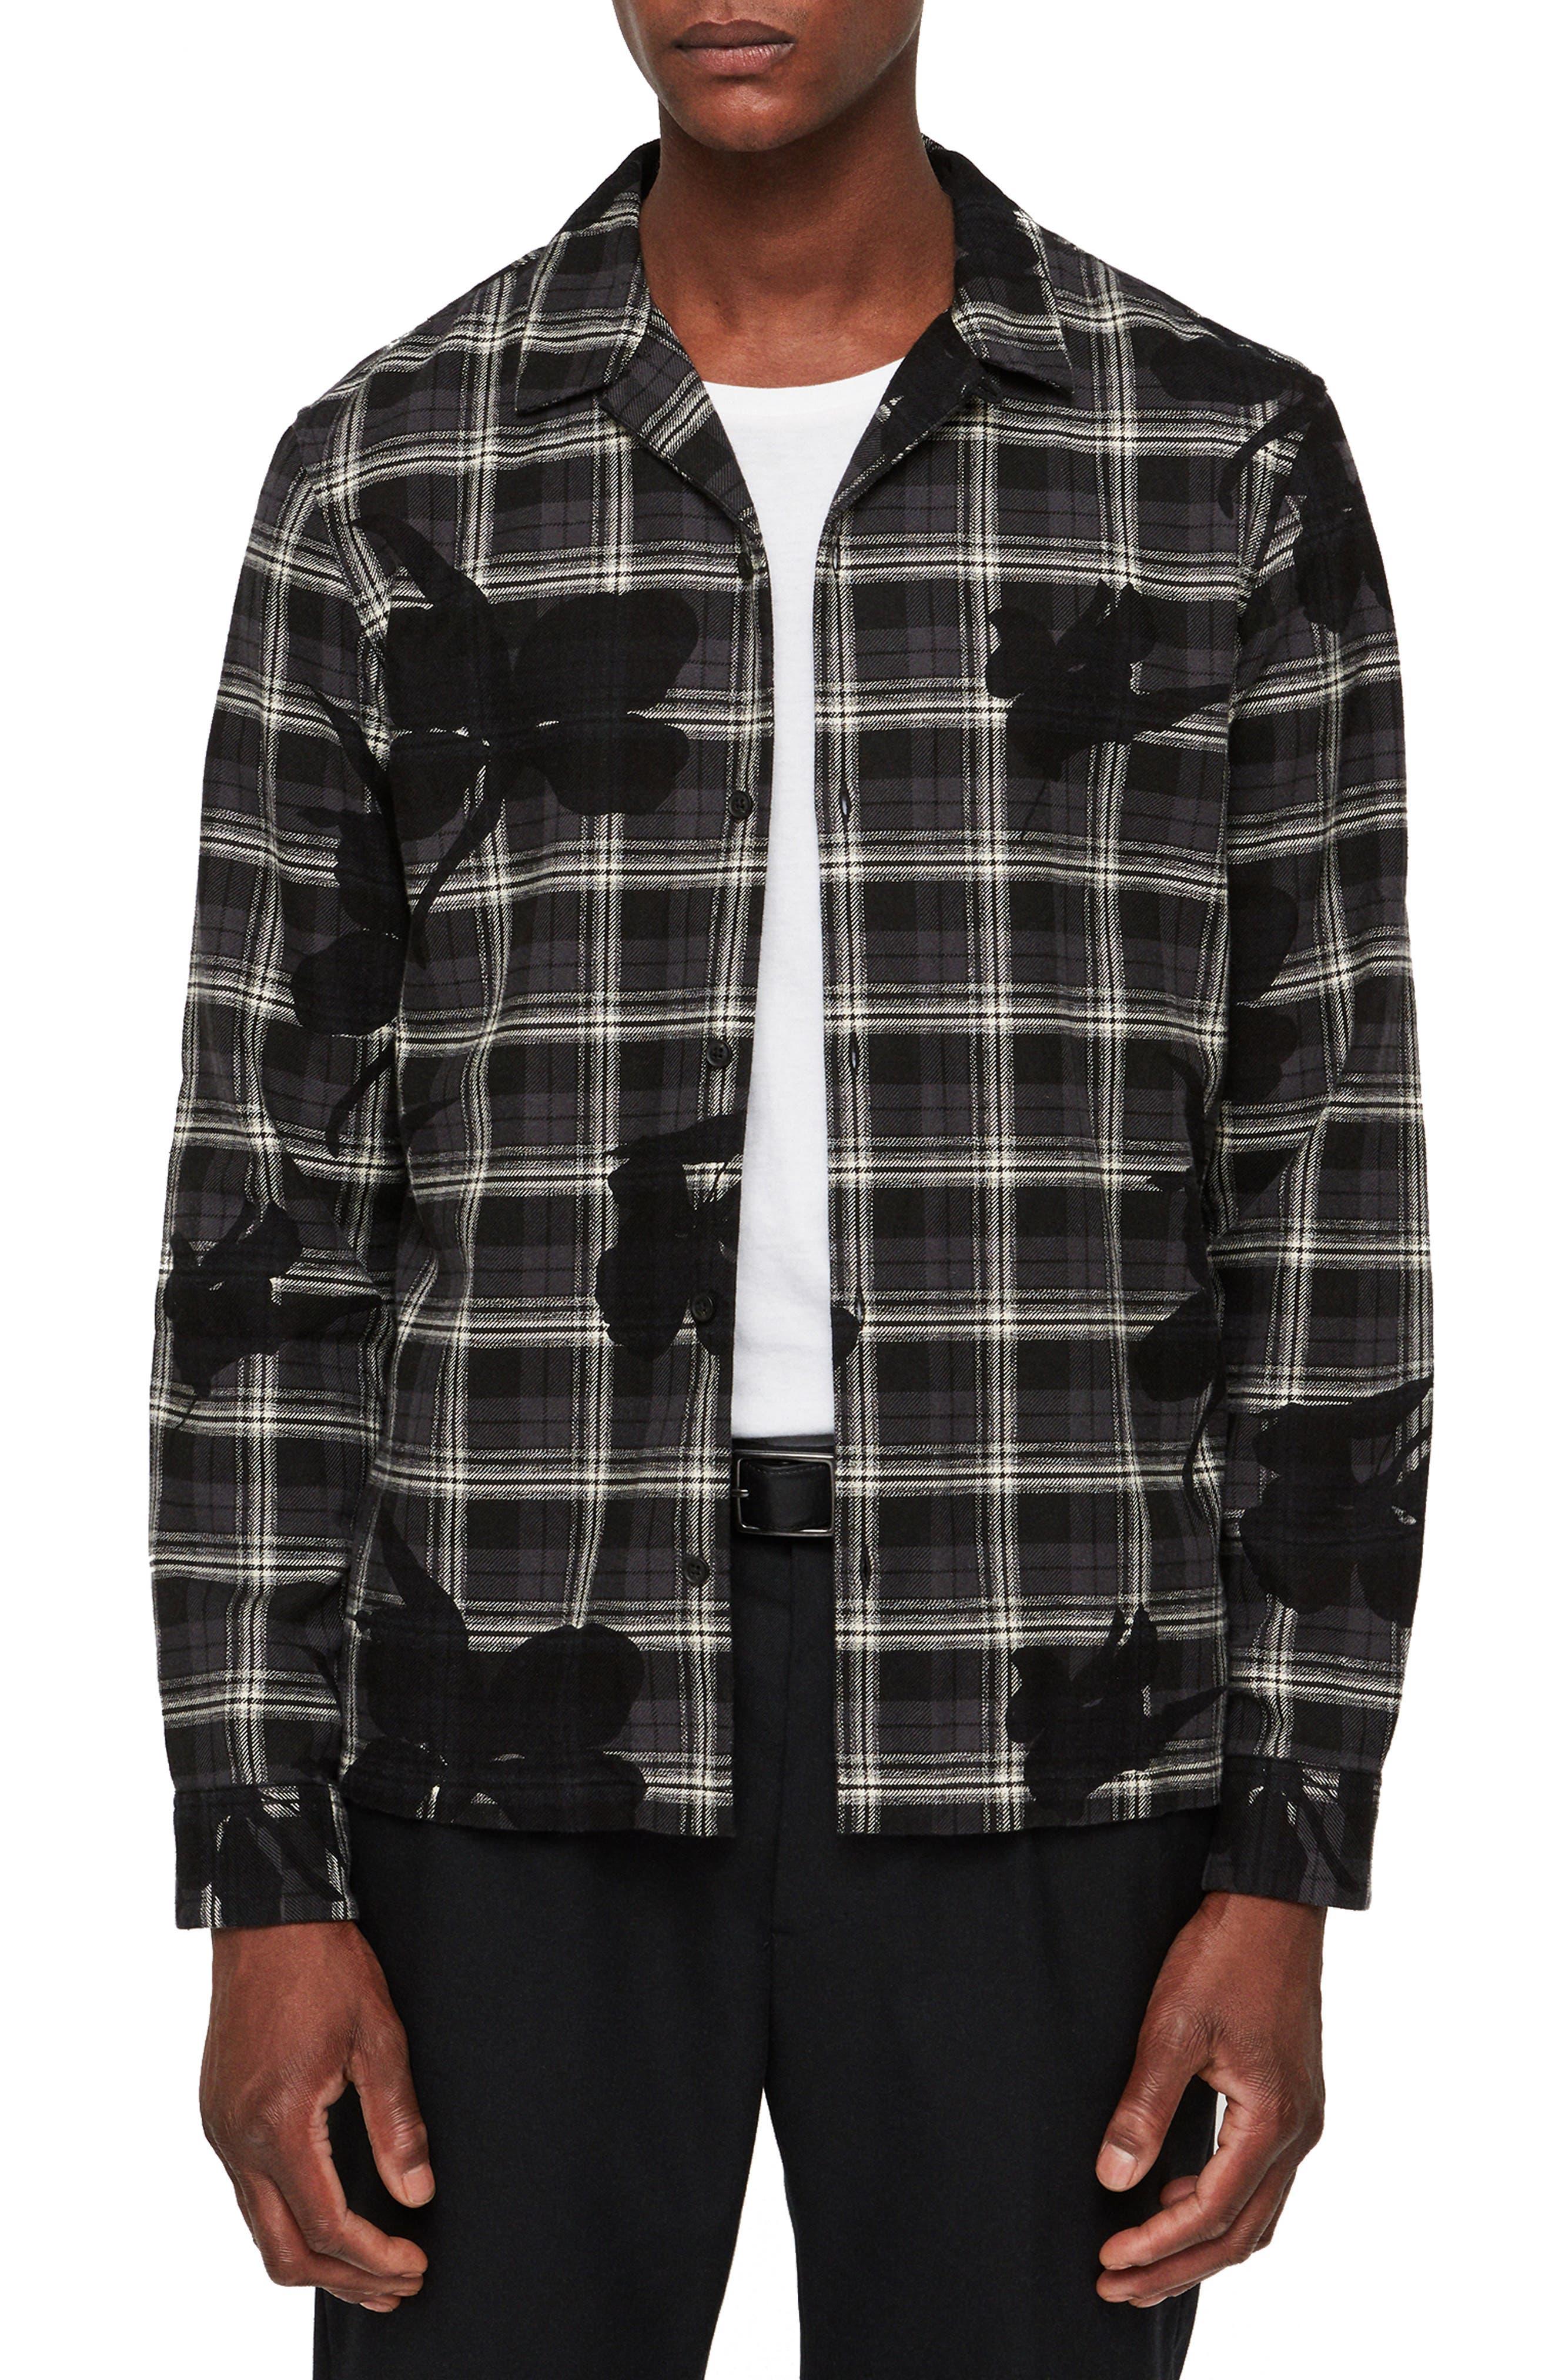 Lilyplaid Slim Fit Flannel Shirt, Main, color, 001